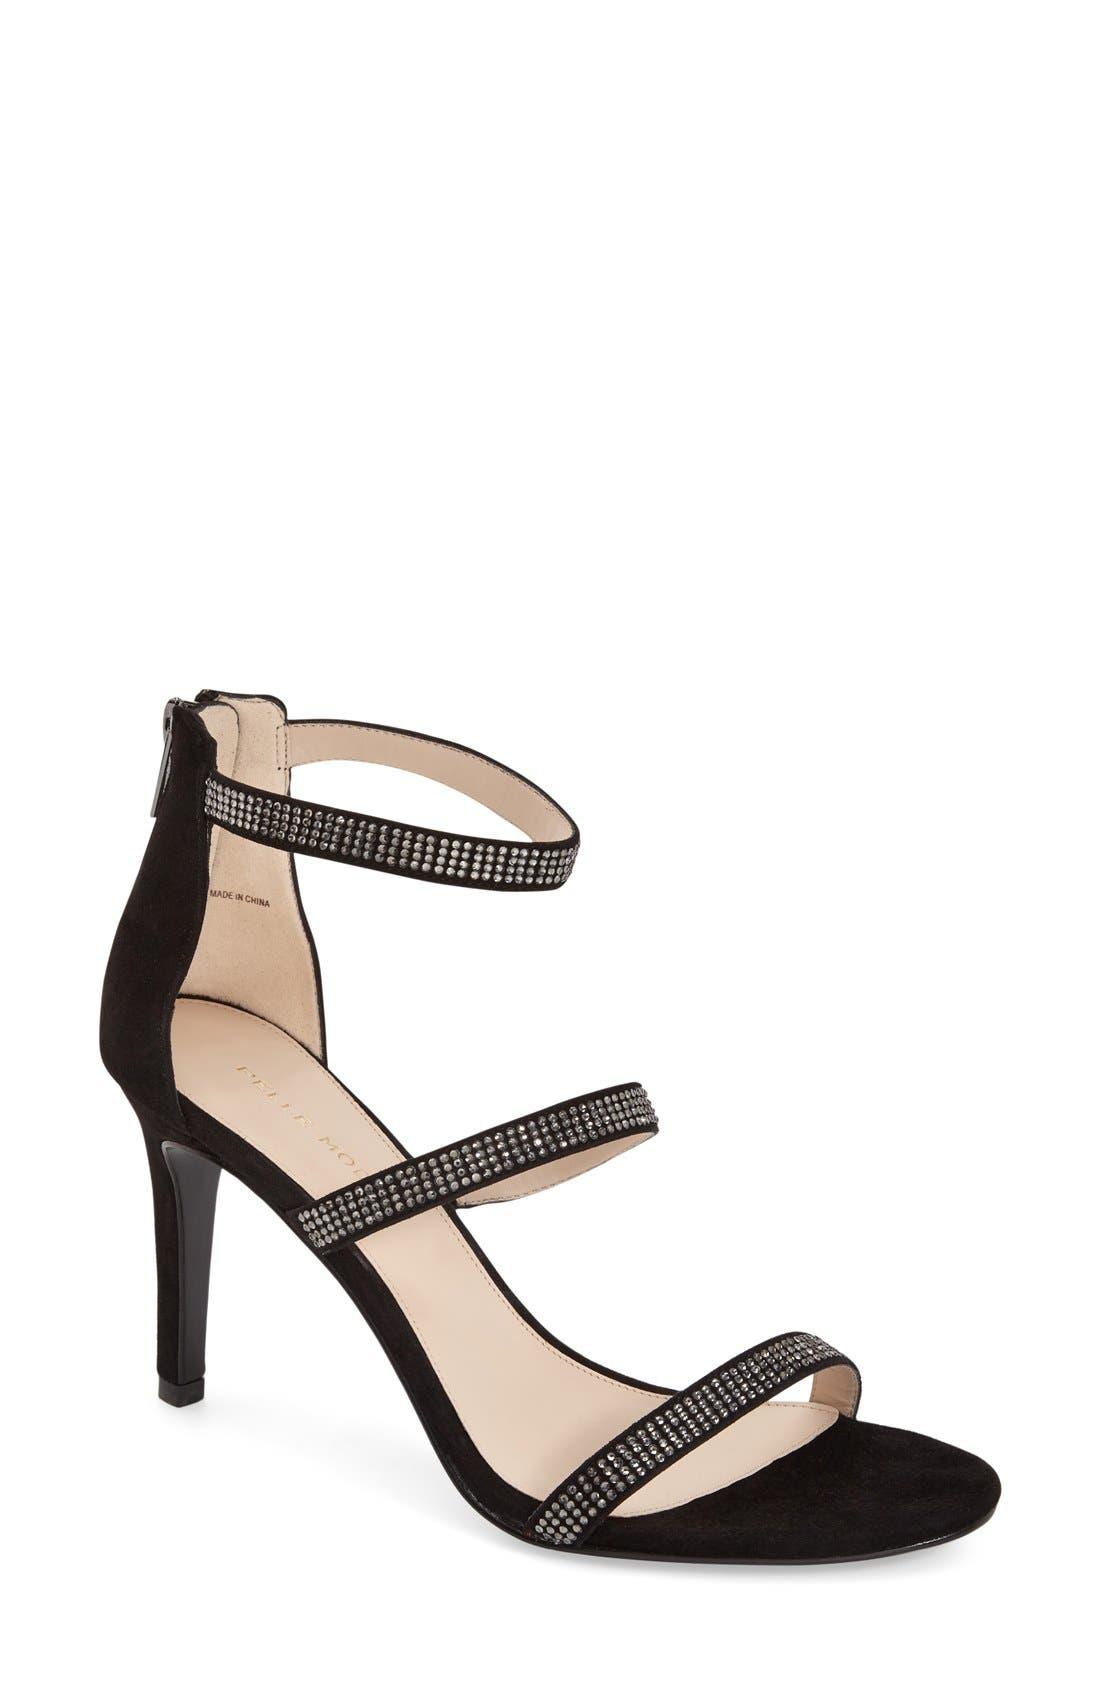 Main Image - Pelle Moda 'Dalia' Three Strap Sandal (Women)